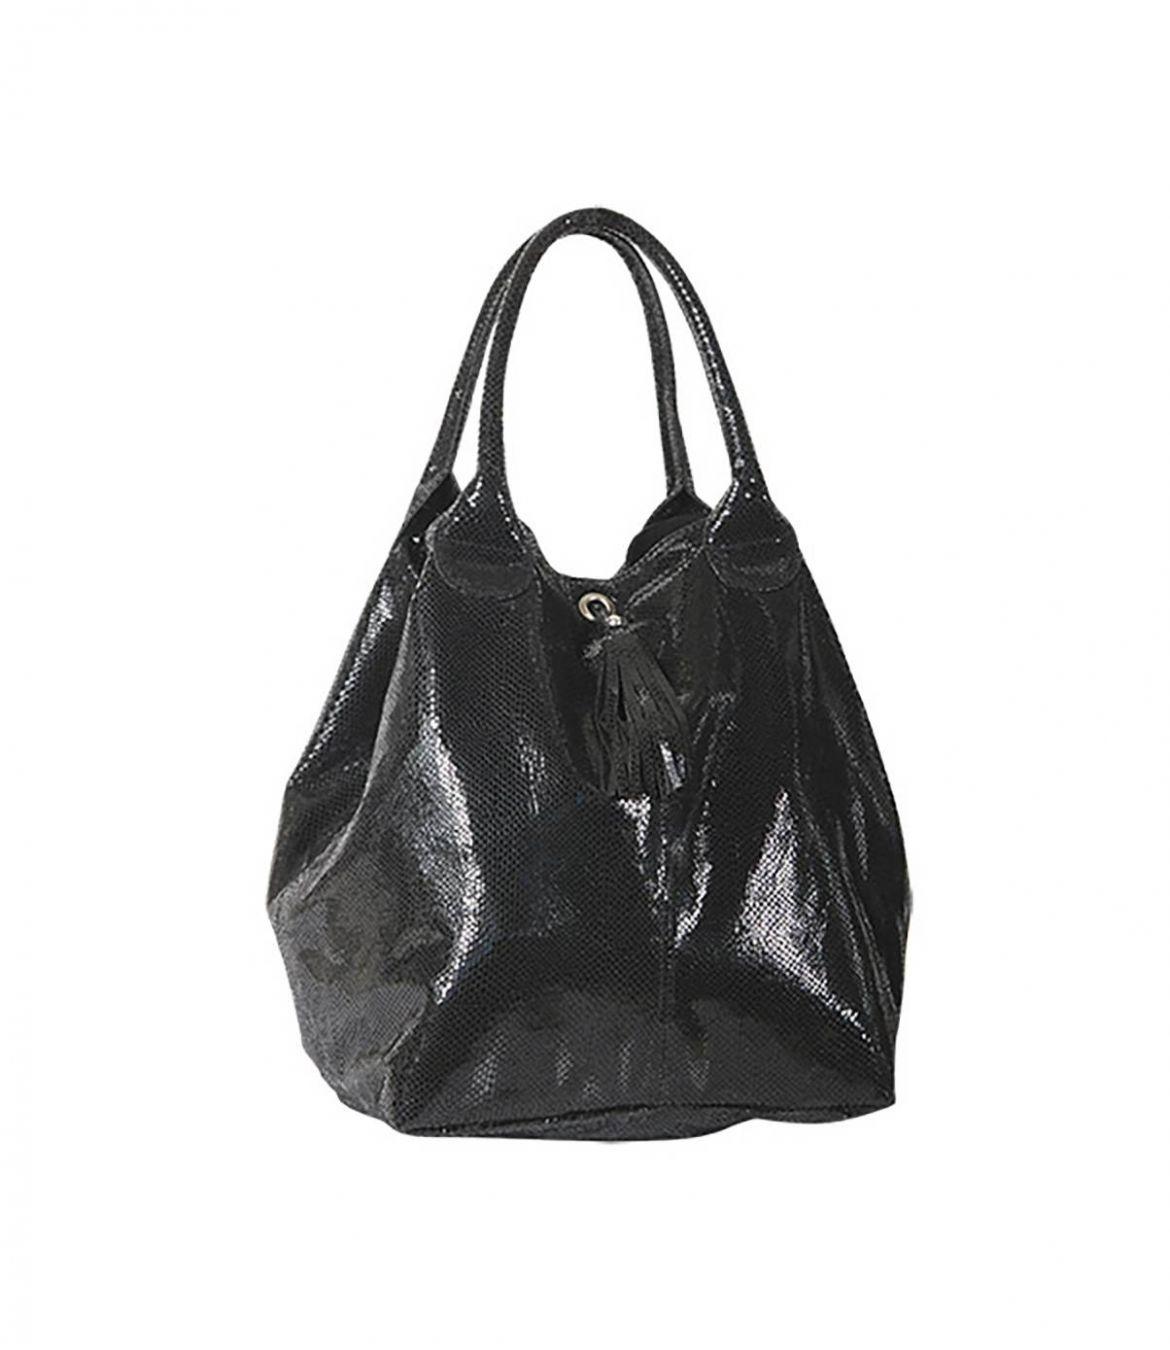 SORBET SHINY Women's Leather Bag 35x55 cm Storiatipic - 1